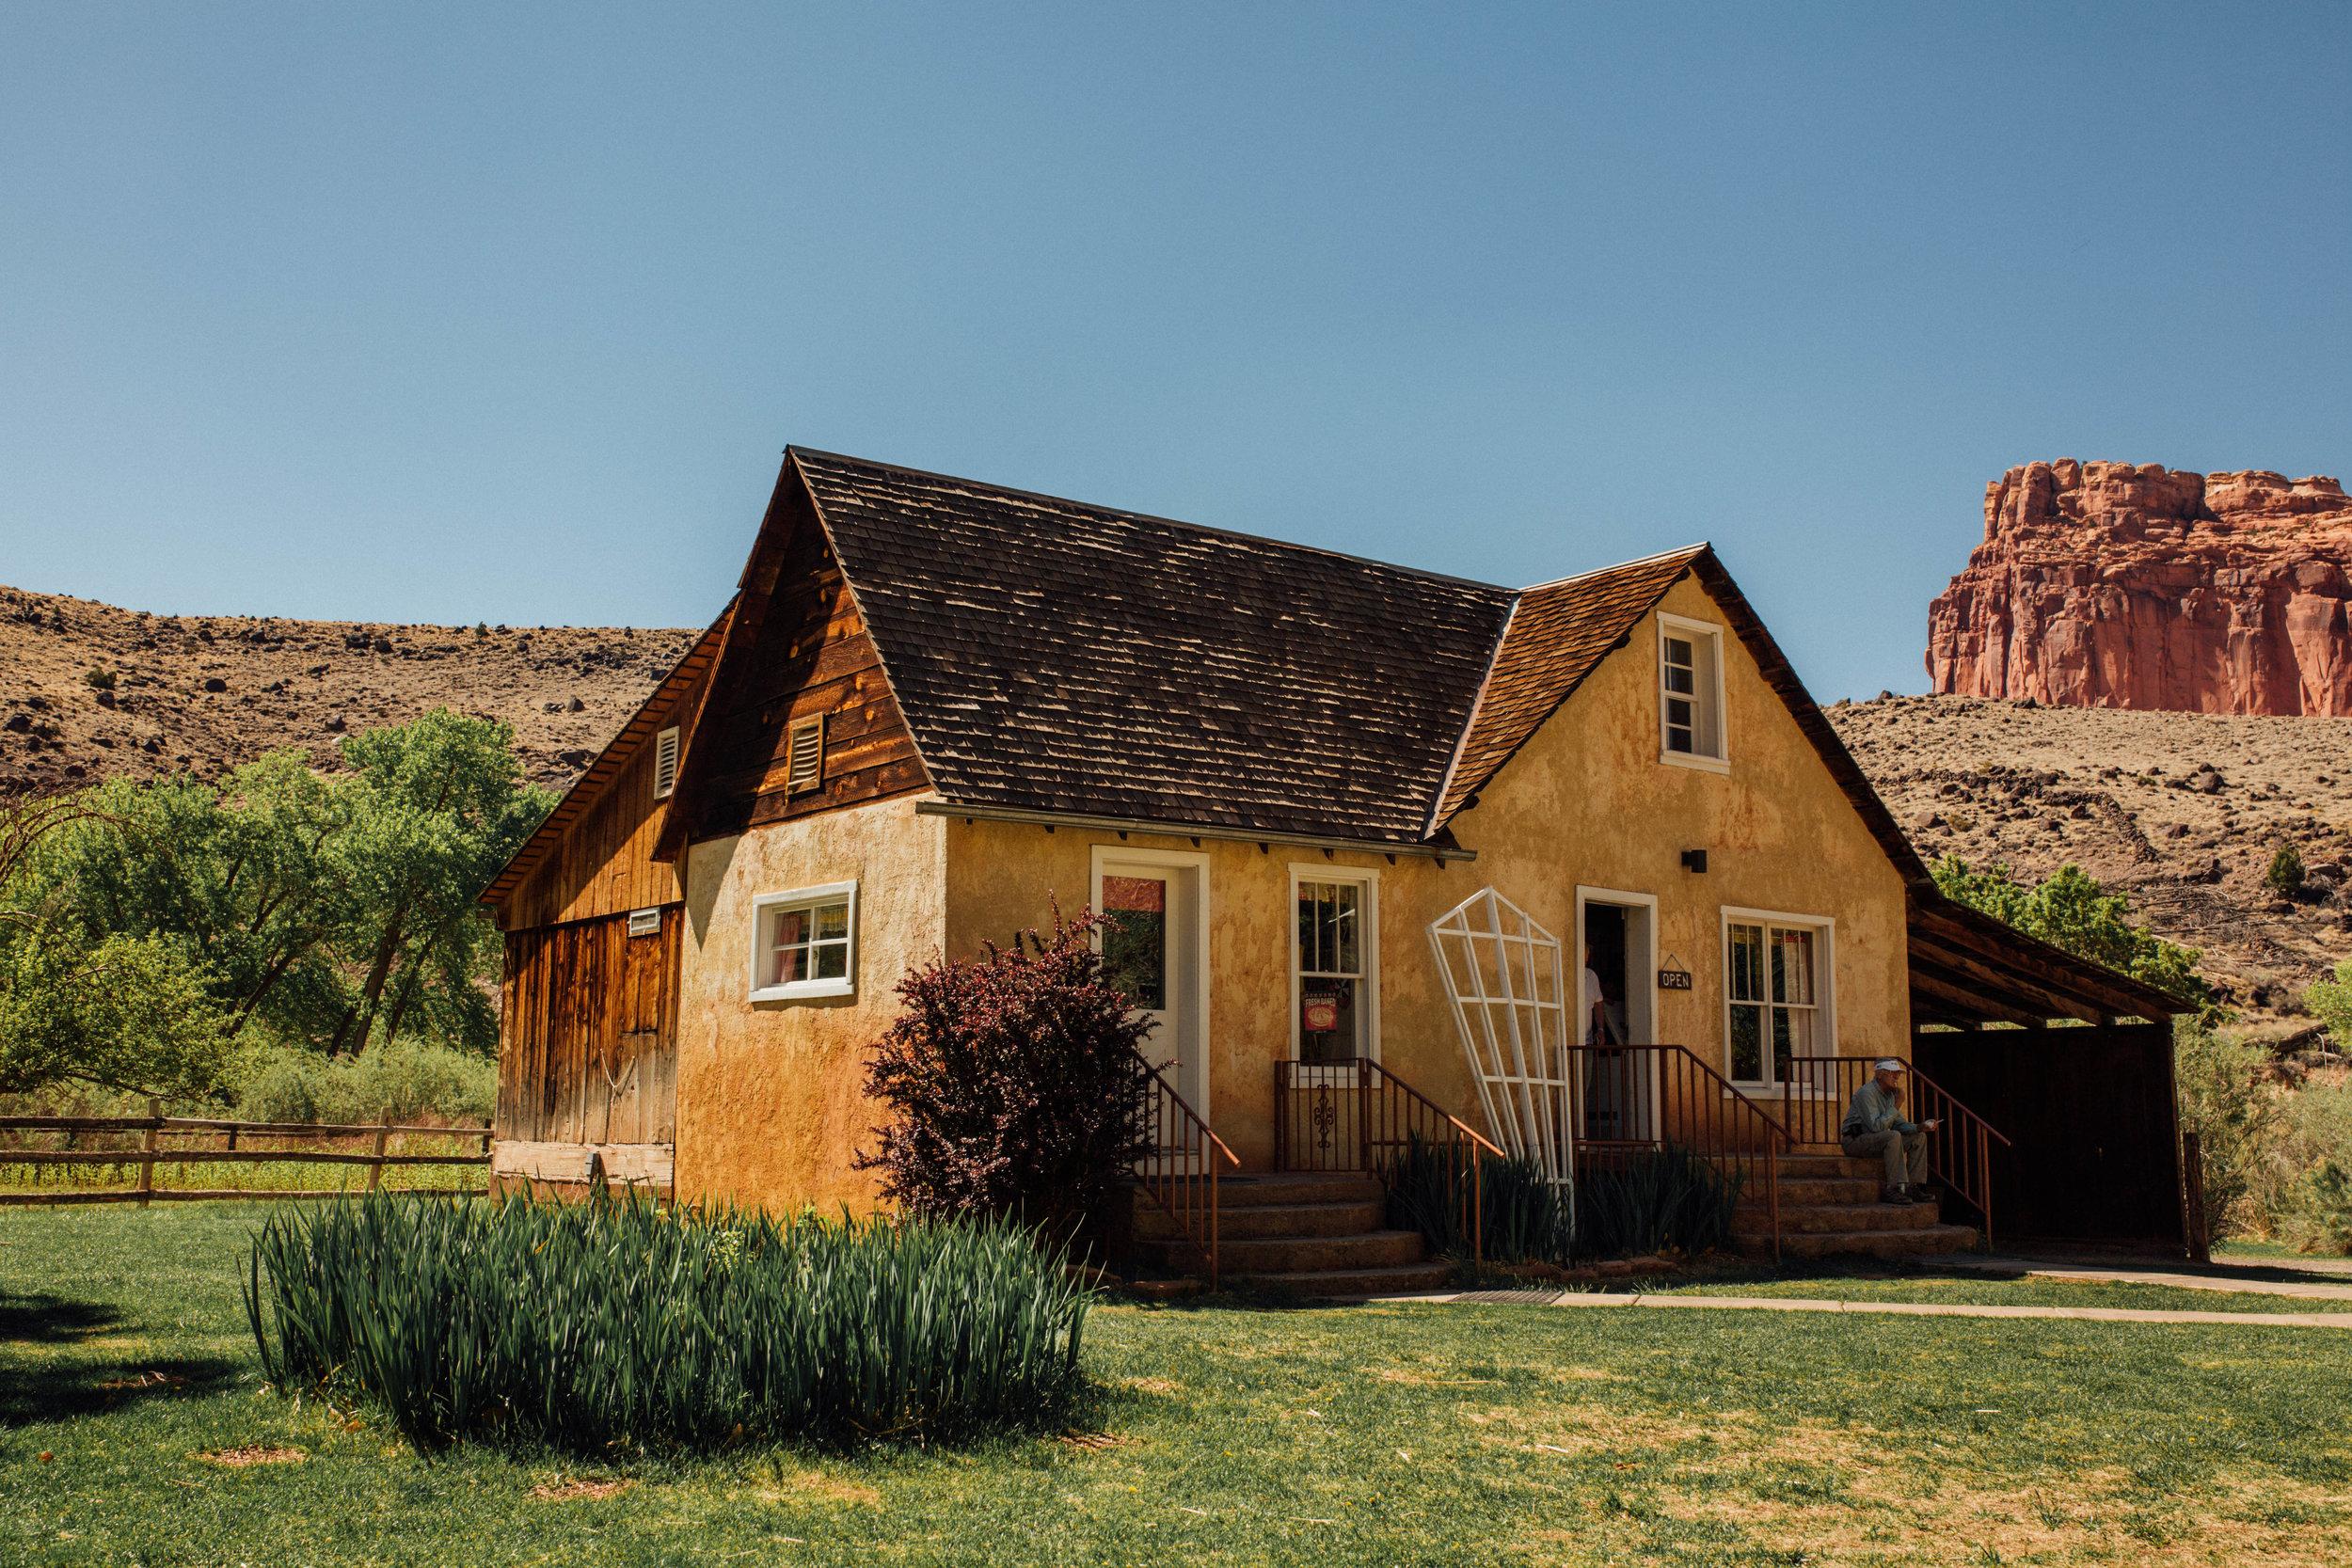 Gifford Homestead - Travel Photography